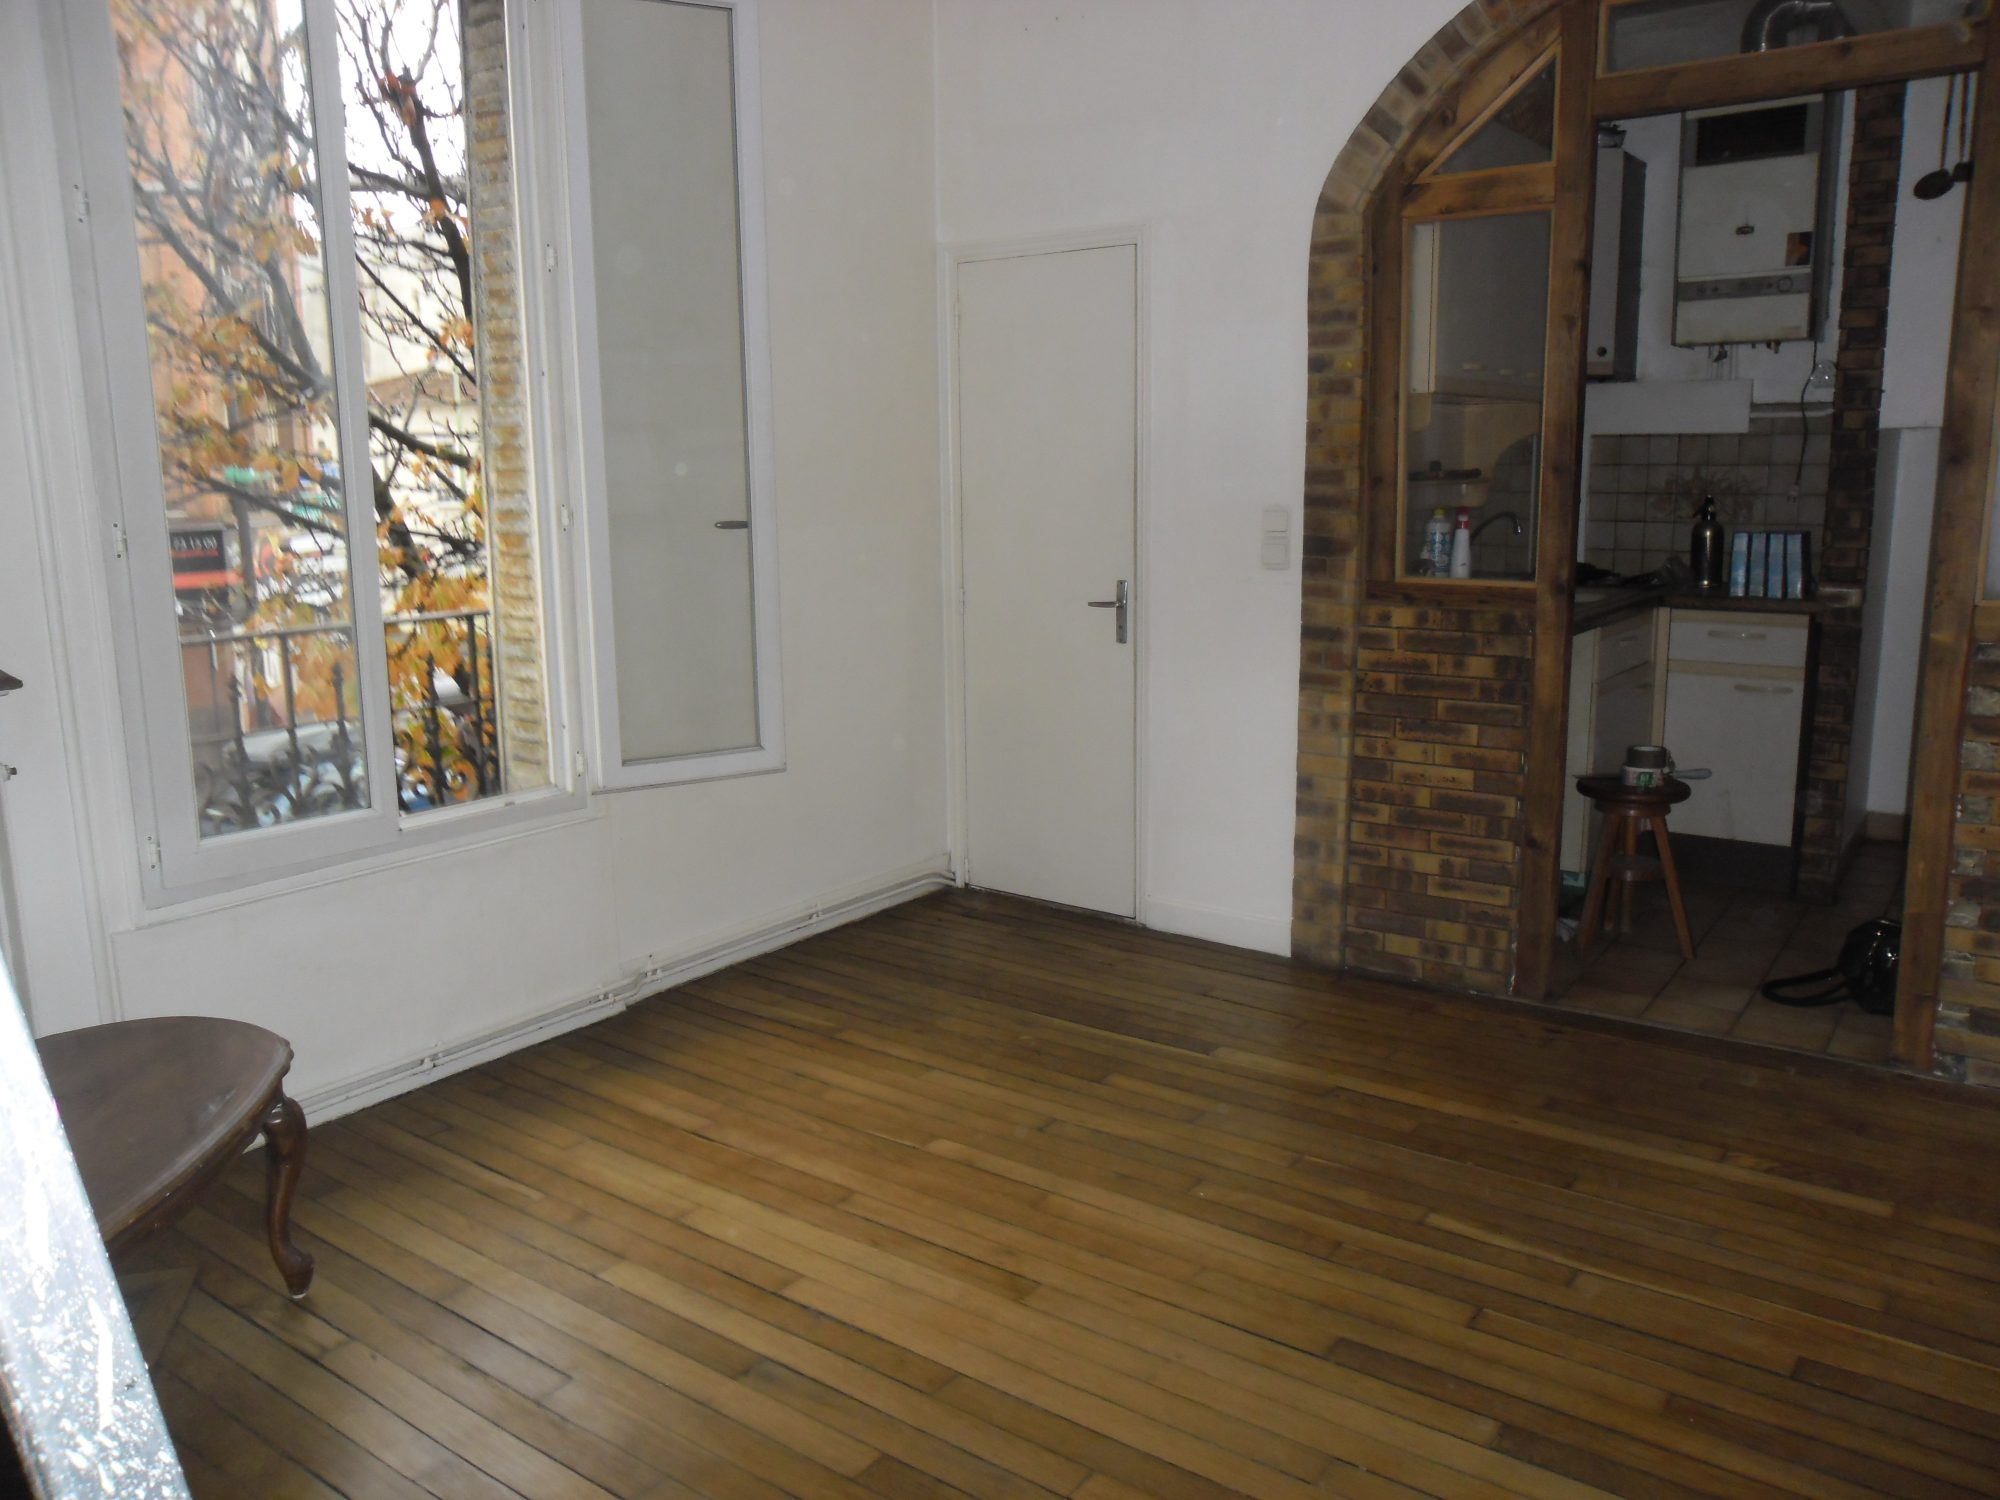 appartement 2 pieces vitry sur seine casanova immobilier ivry sur seine. Black Bedroom Furniture Sets. Home Design Ideas